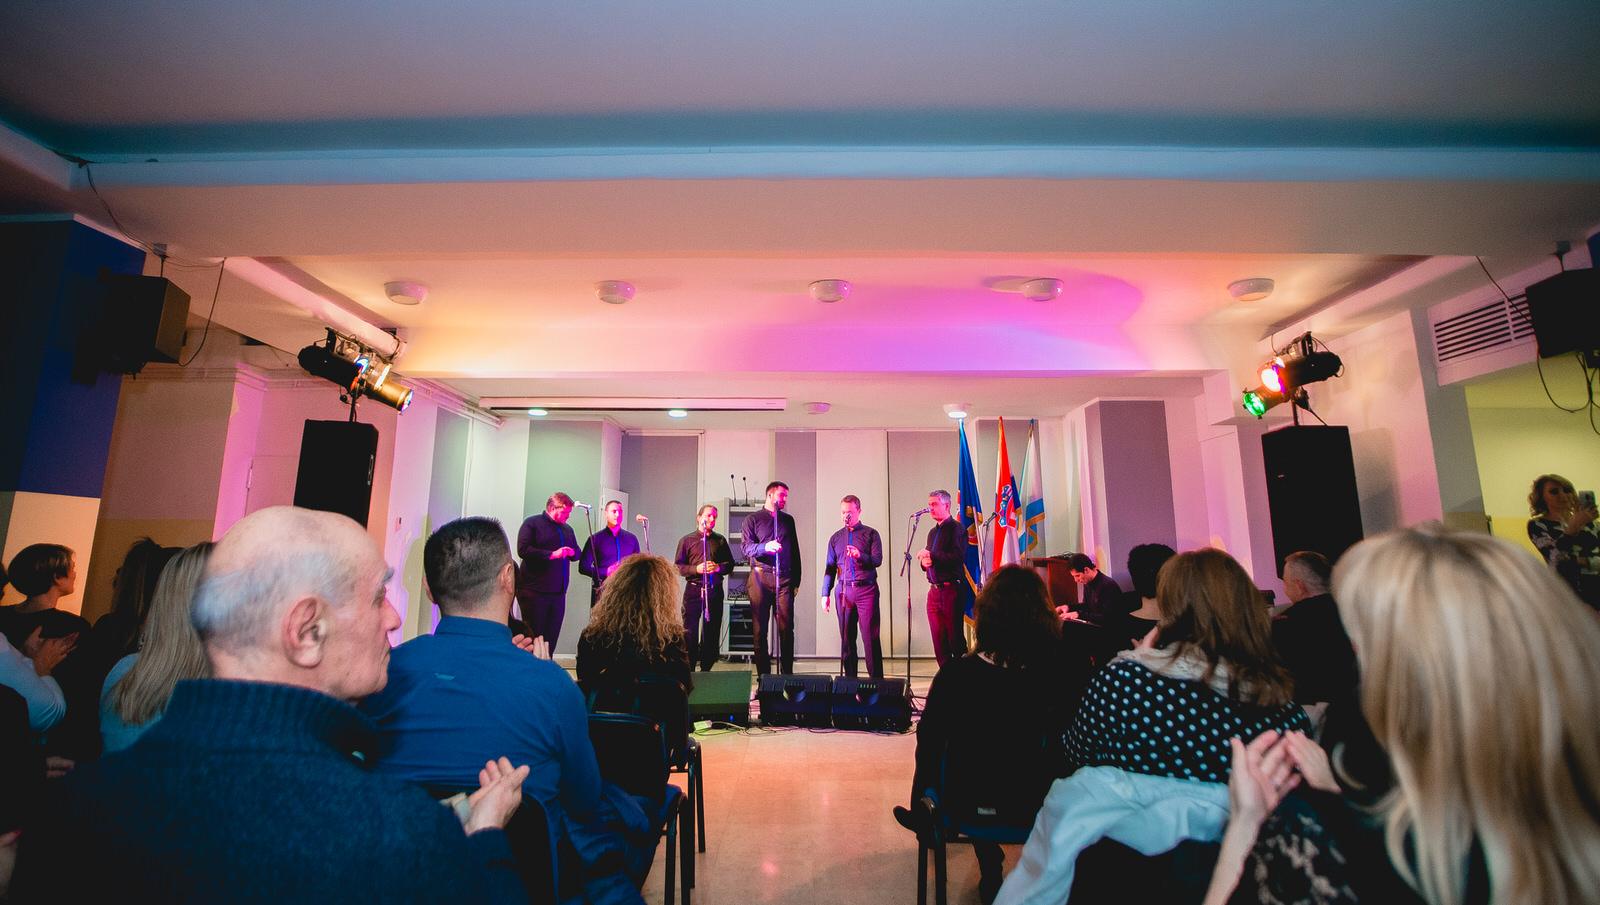 likaclub_koncert-klapa-cambi_kic-gospić_2019-17